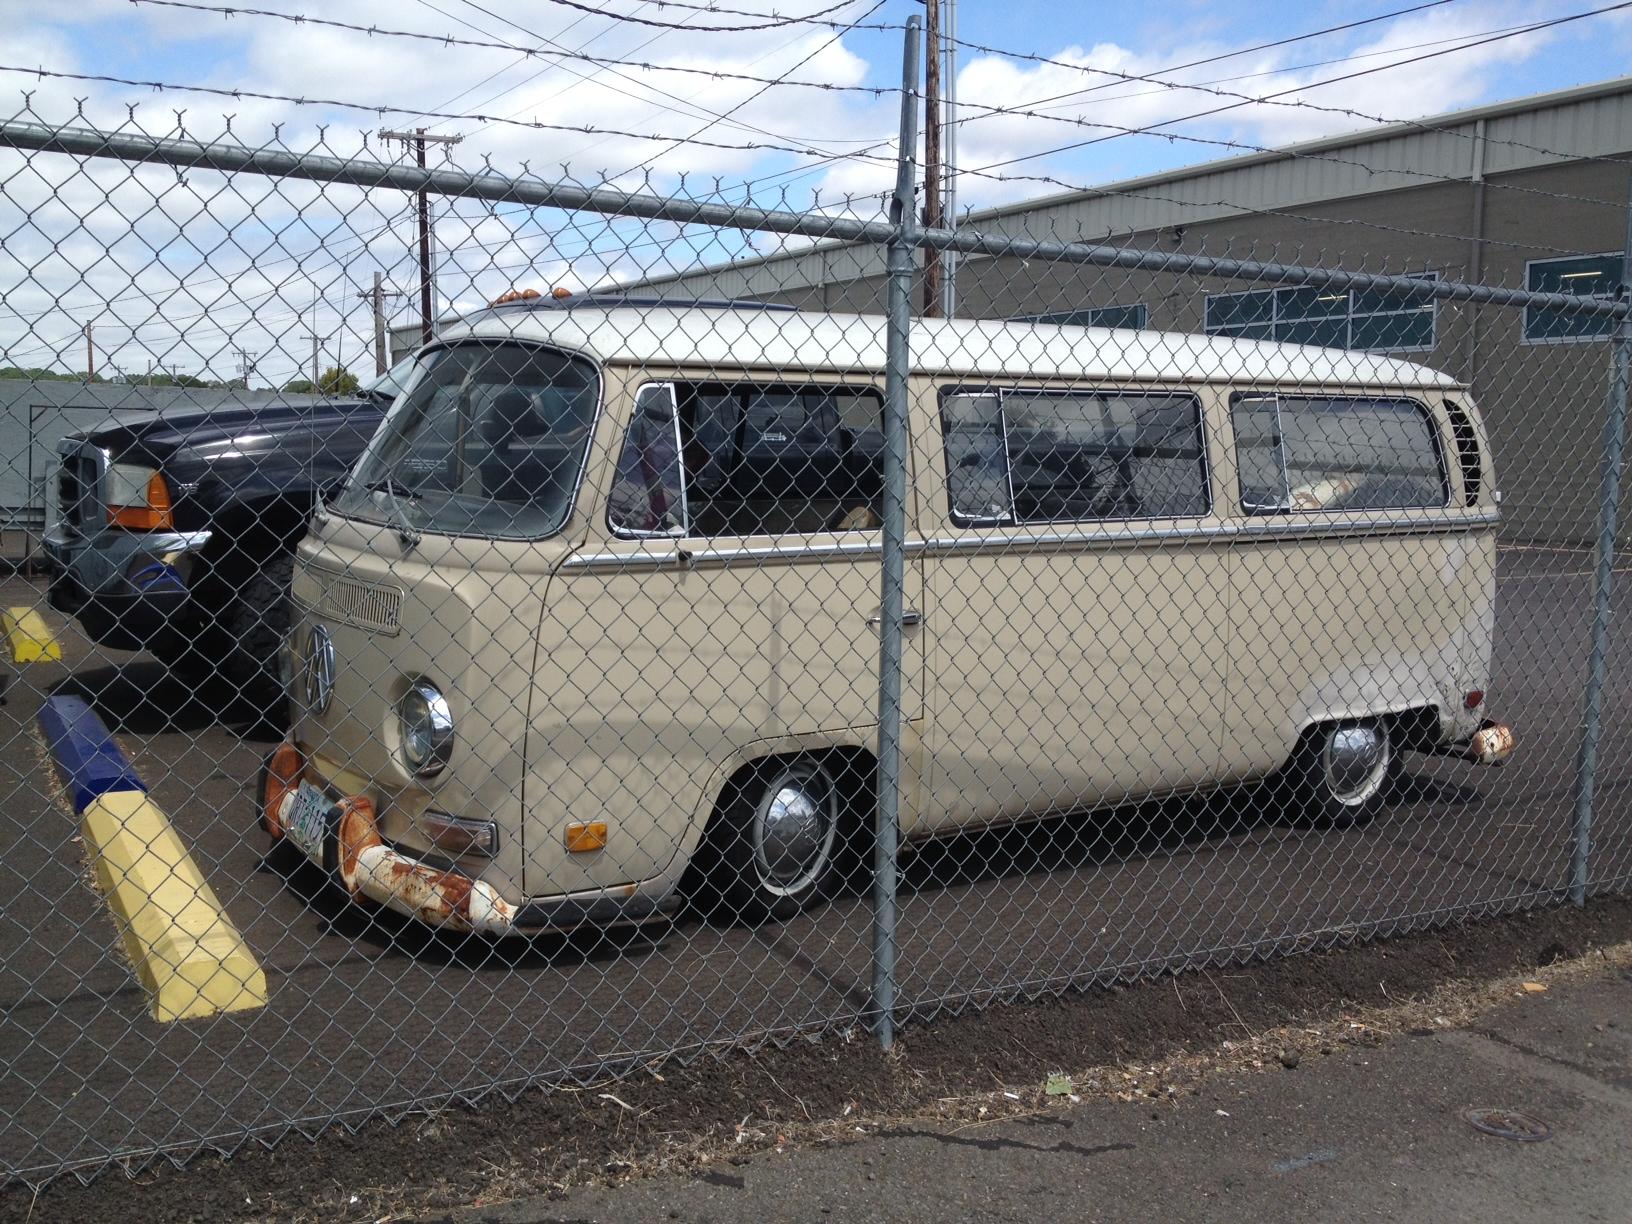 wagenswest slam bay special   volkswagen bus lowering kit